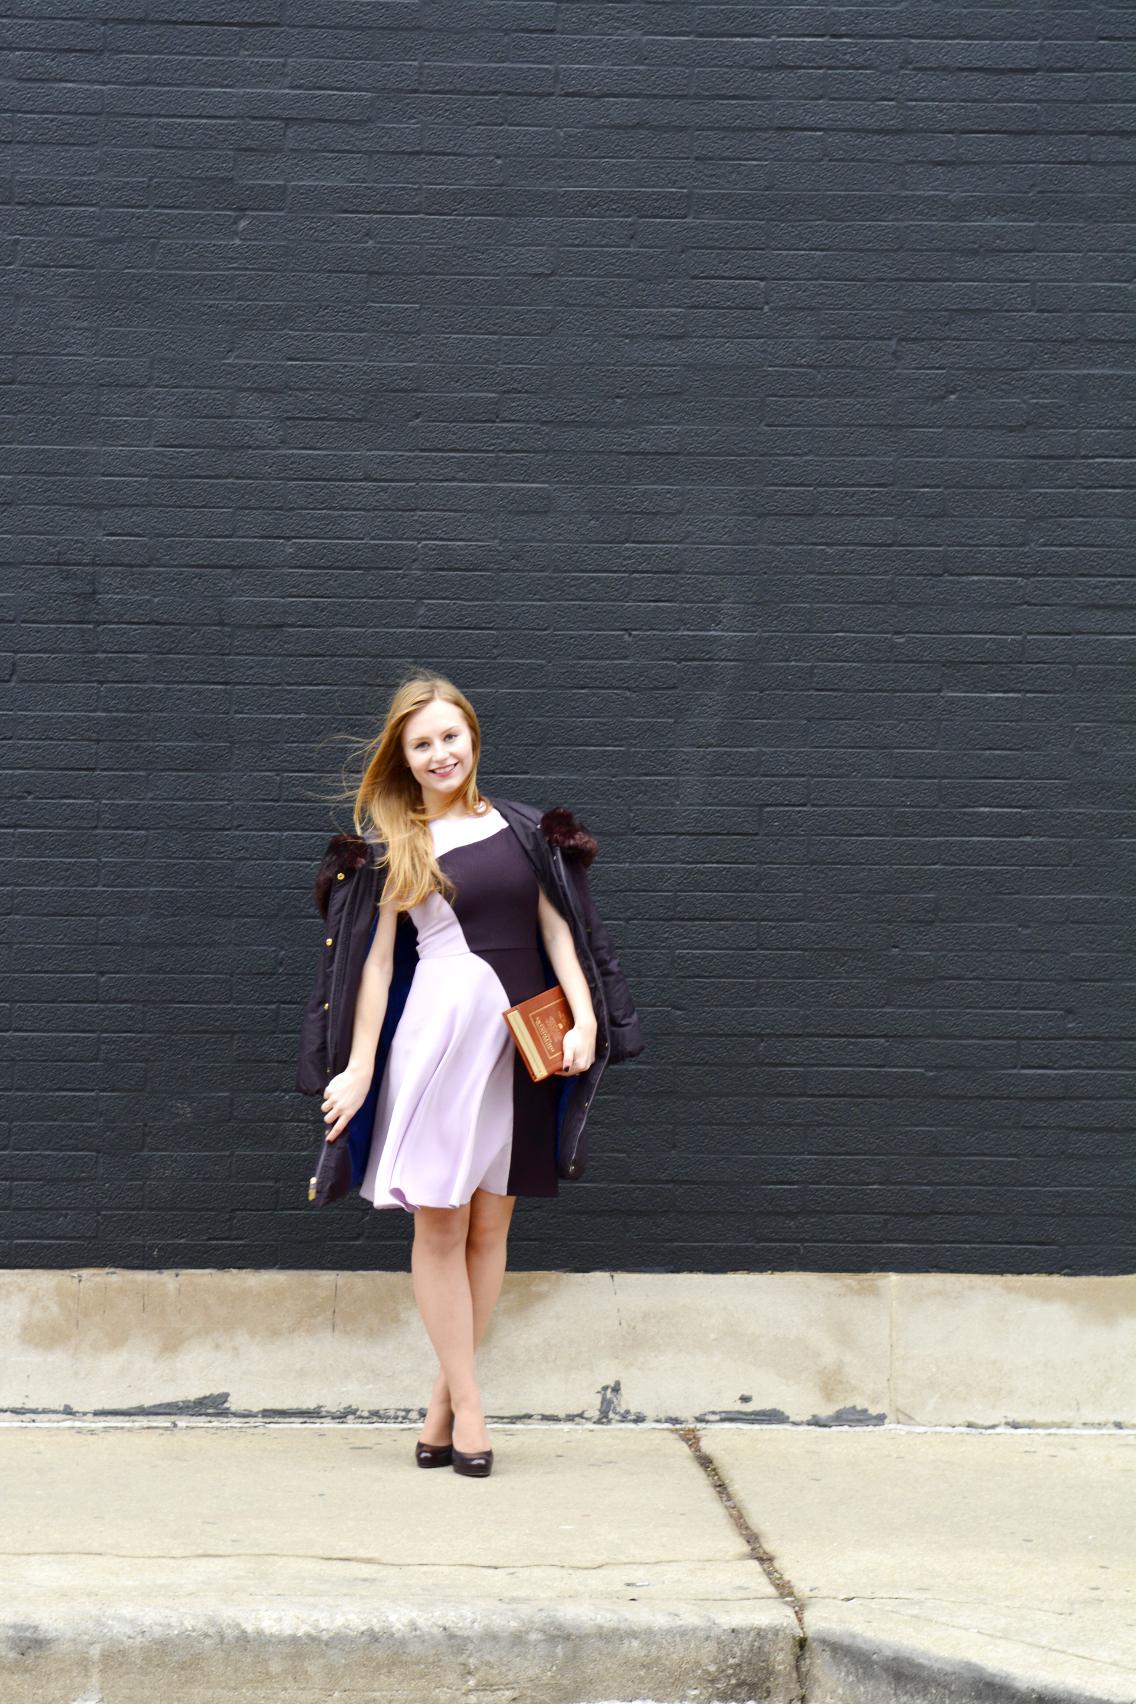 3.1 Phillip Lim Colorblock Dress Kate Spade Dictionary Clutch 6